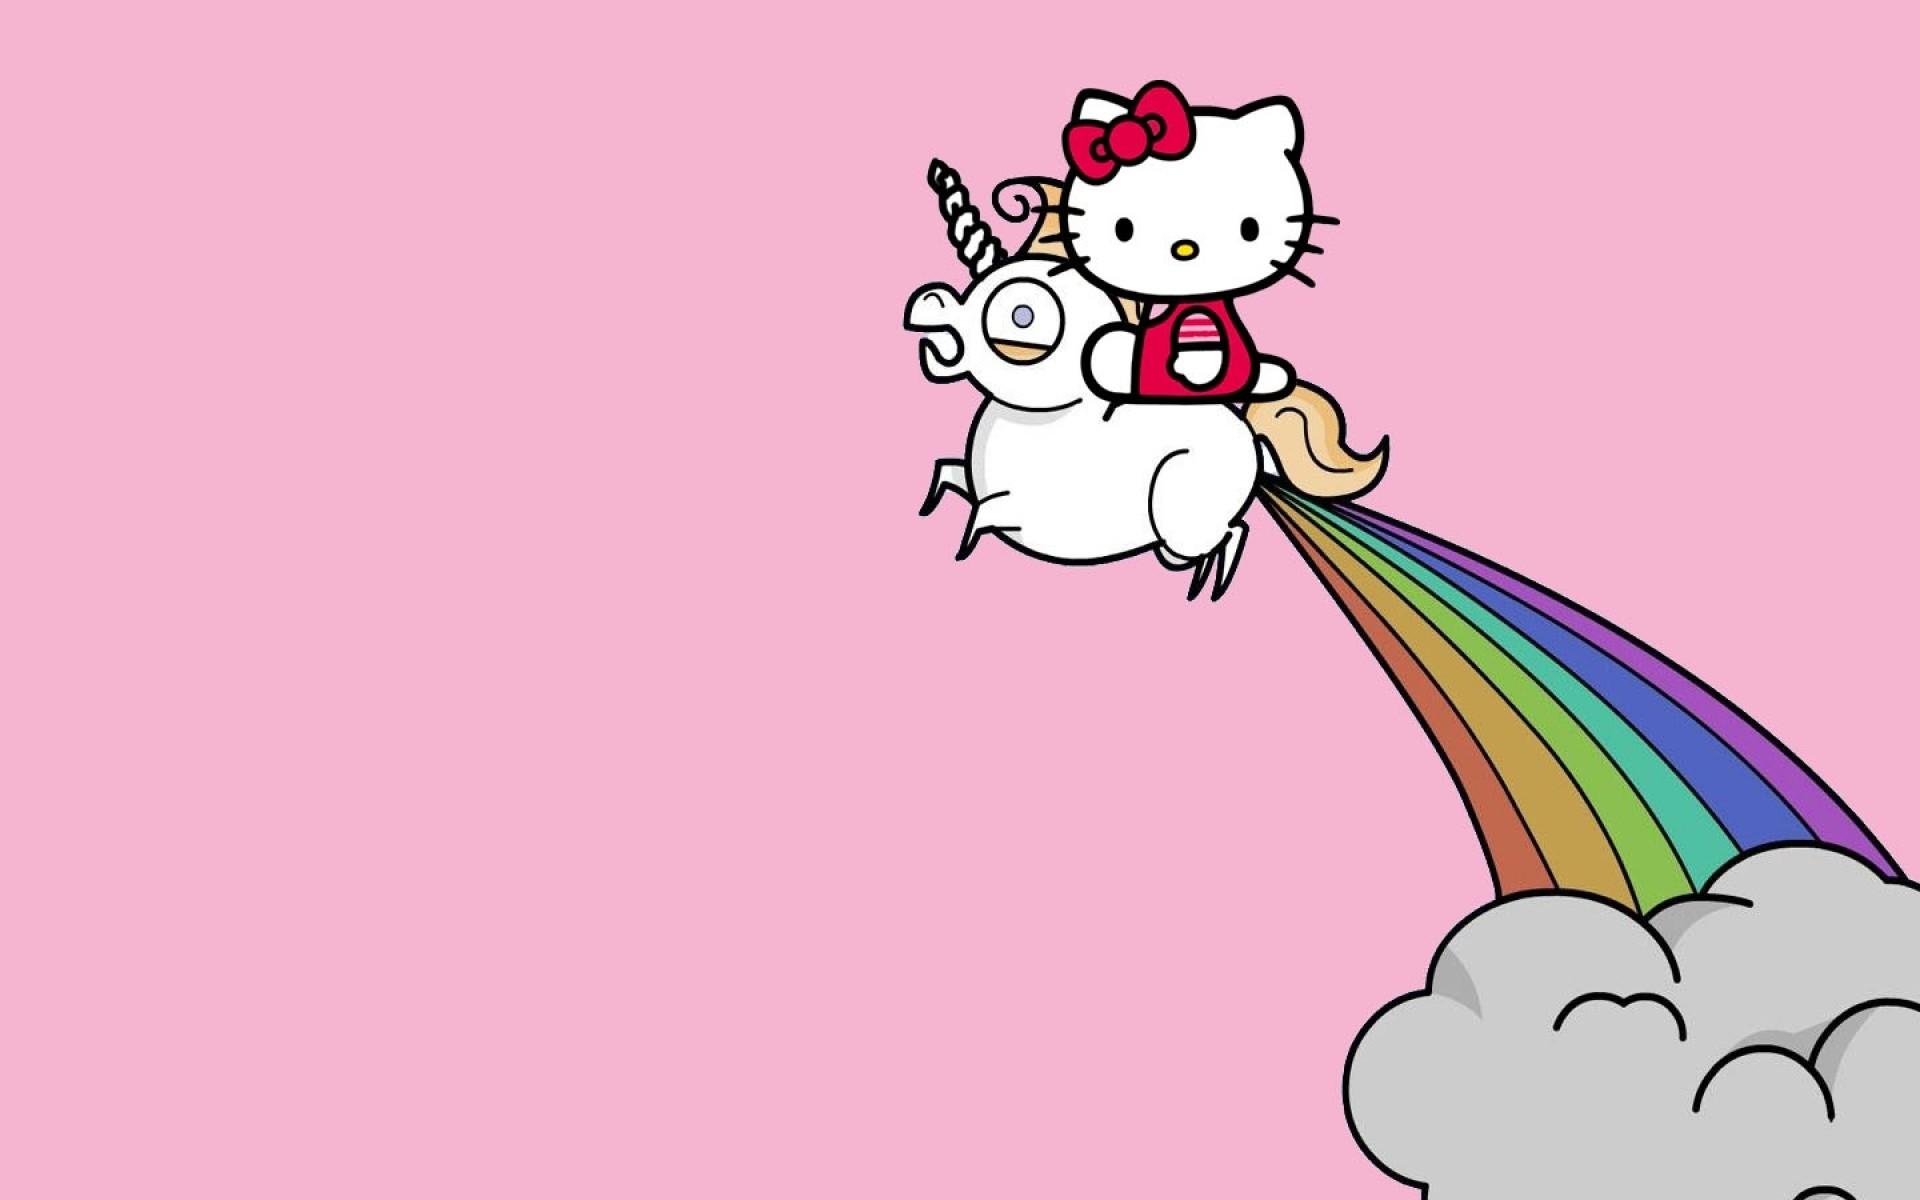 Good Wallpaper Hello Kitty Angel - 1053351-best-hello-kitty-screensavers-and-wallpapers-1920x1200  Gallery_882955.jpg